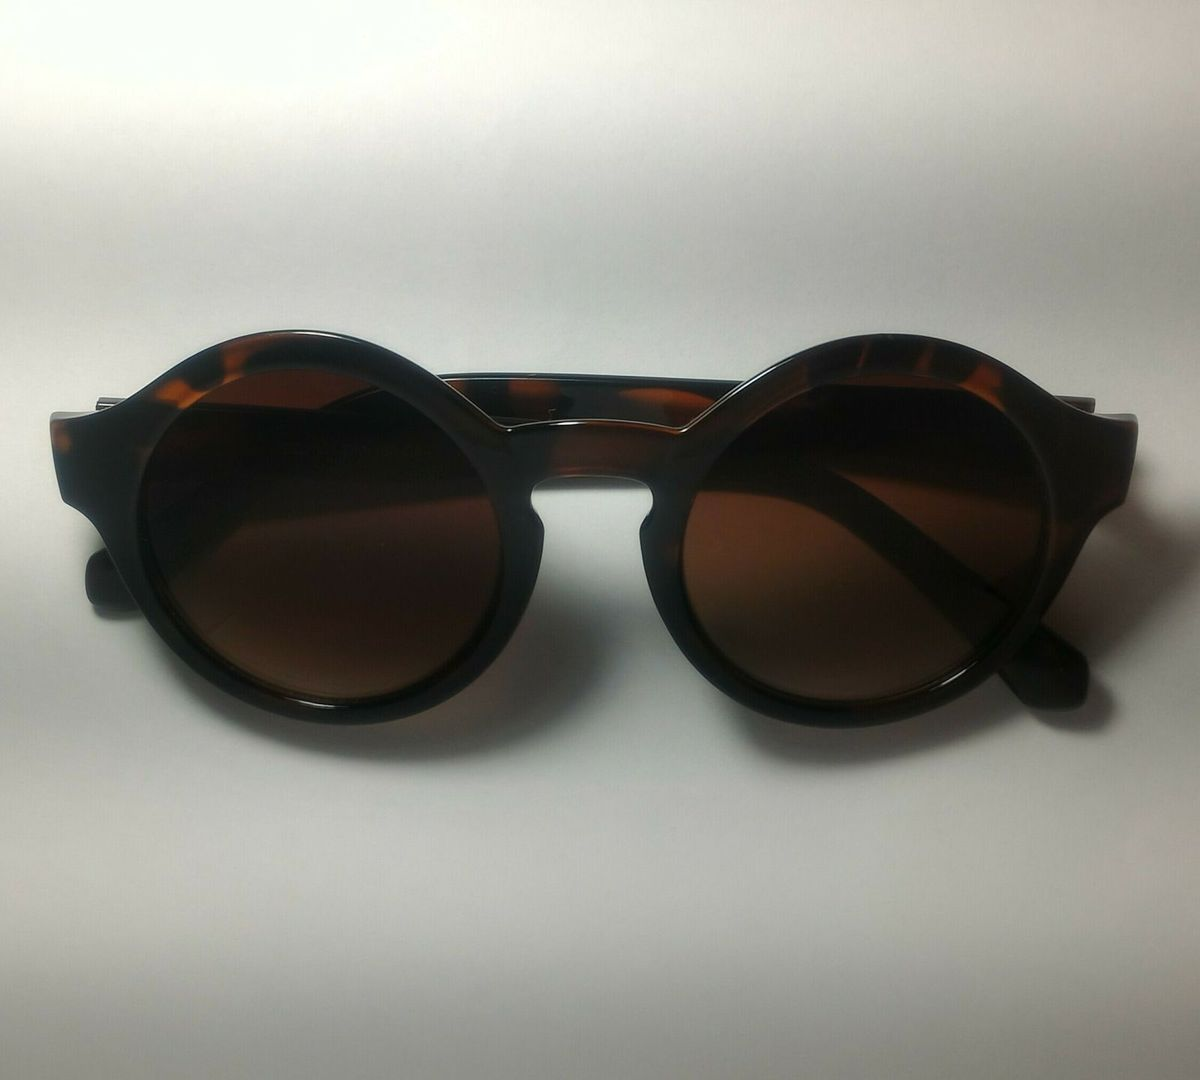 óculos de sol - óculos c-e-a.  Czm6ly9wag90b3muzw5qb2vplmnvbs5ici9wcm9kdwn0cy84otg5nzc3lzhmzjnkmdjizwmymziyntbhzmmwyja5mjy0ztbiythllmpwzw  ... 40e1429b2b